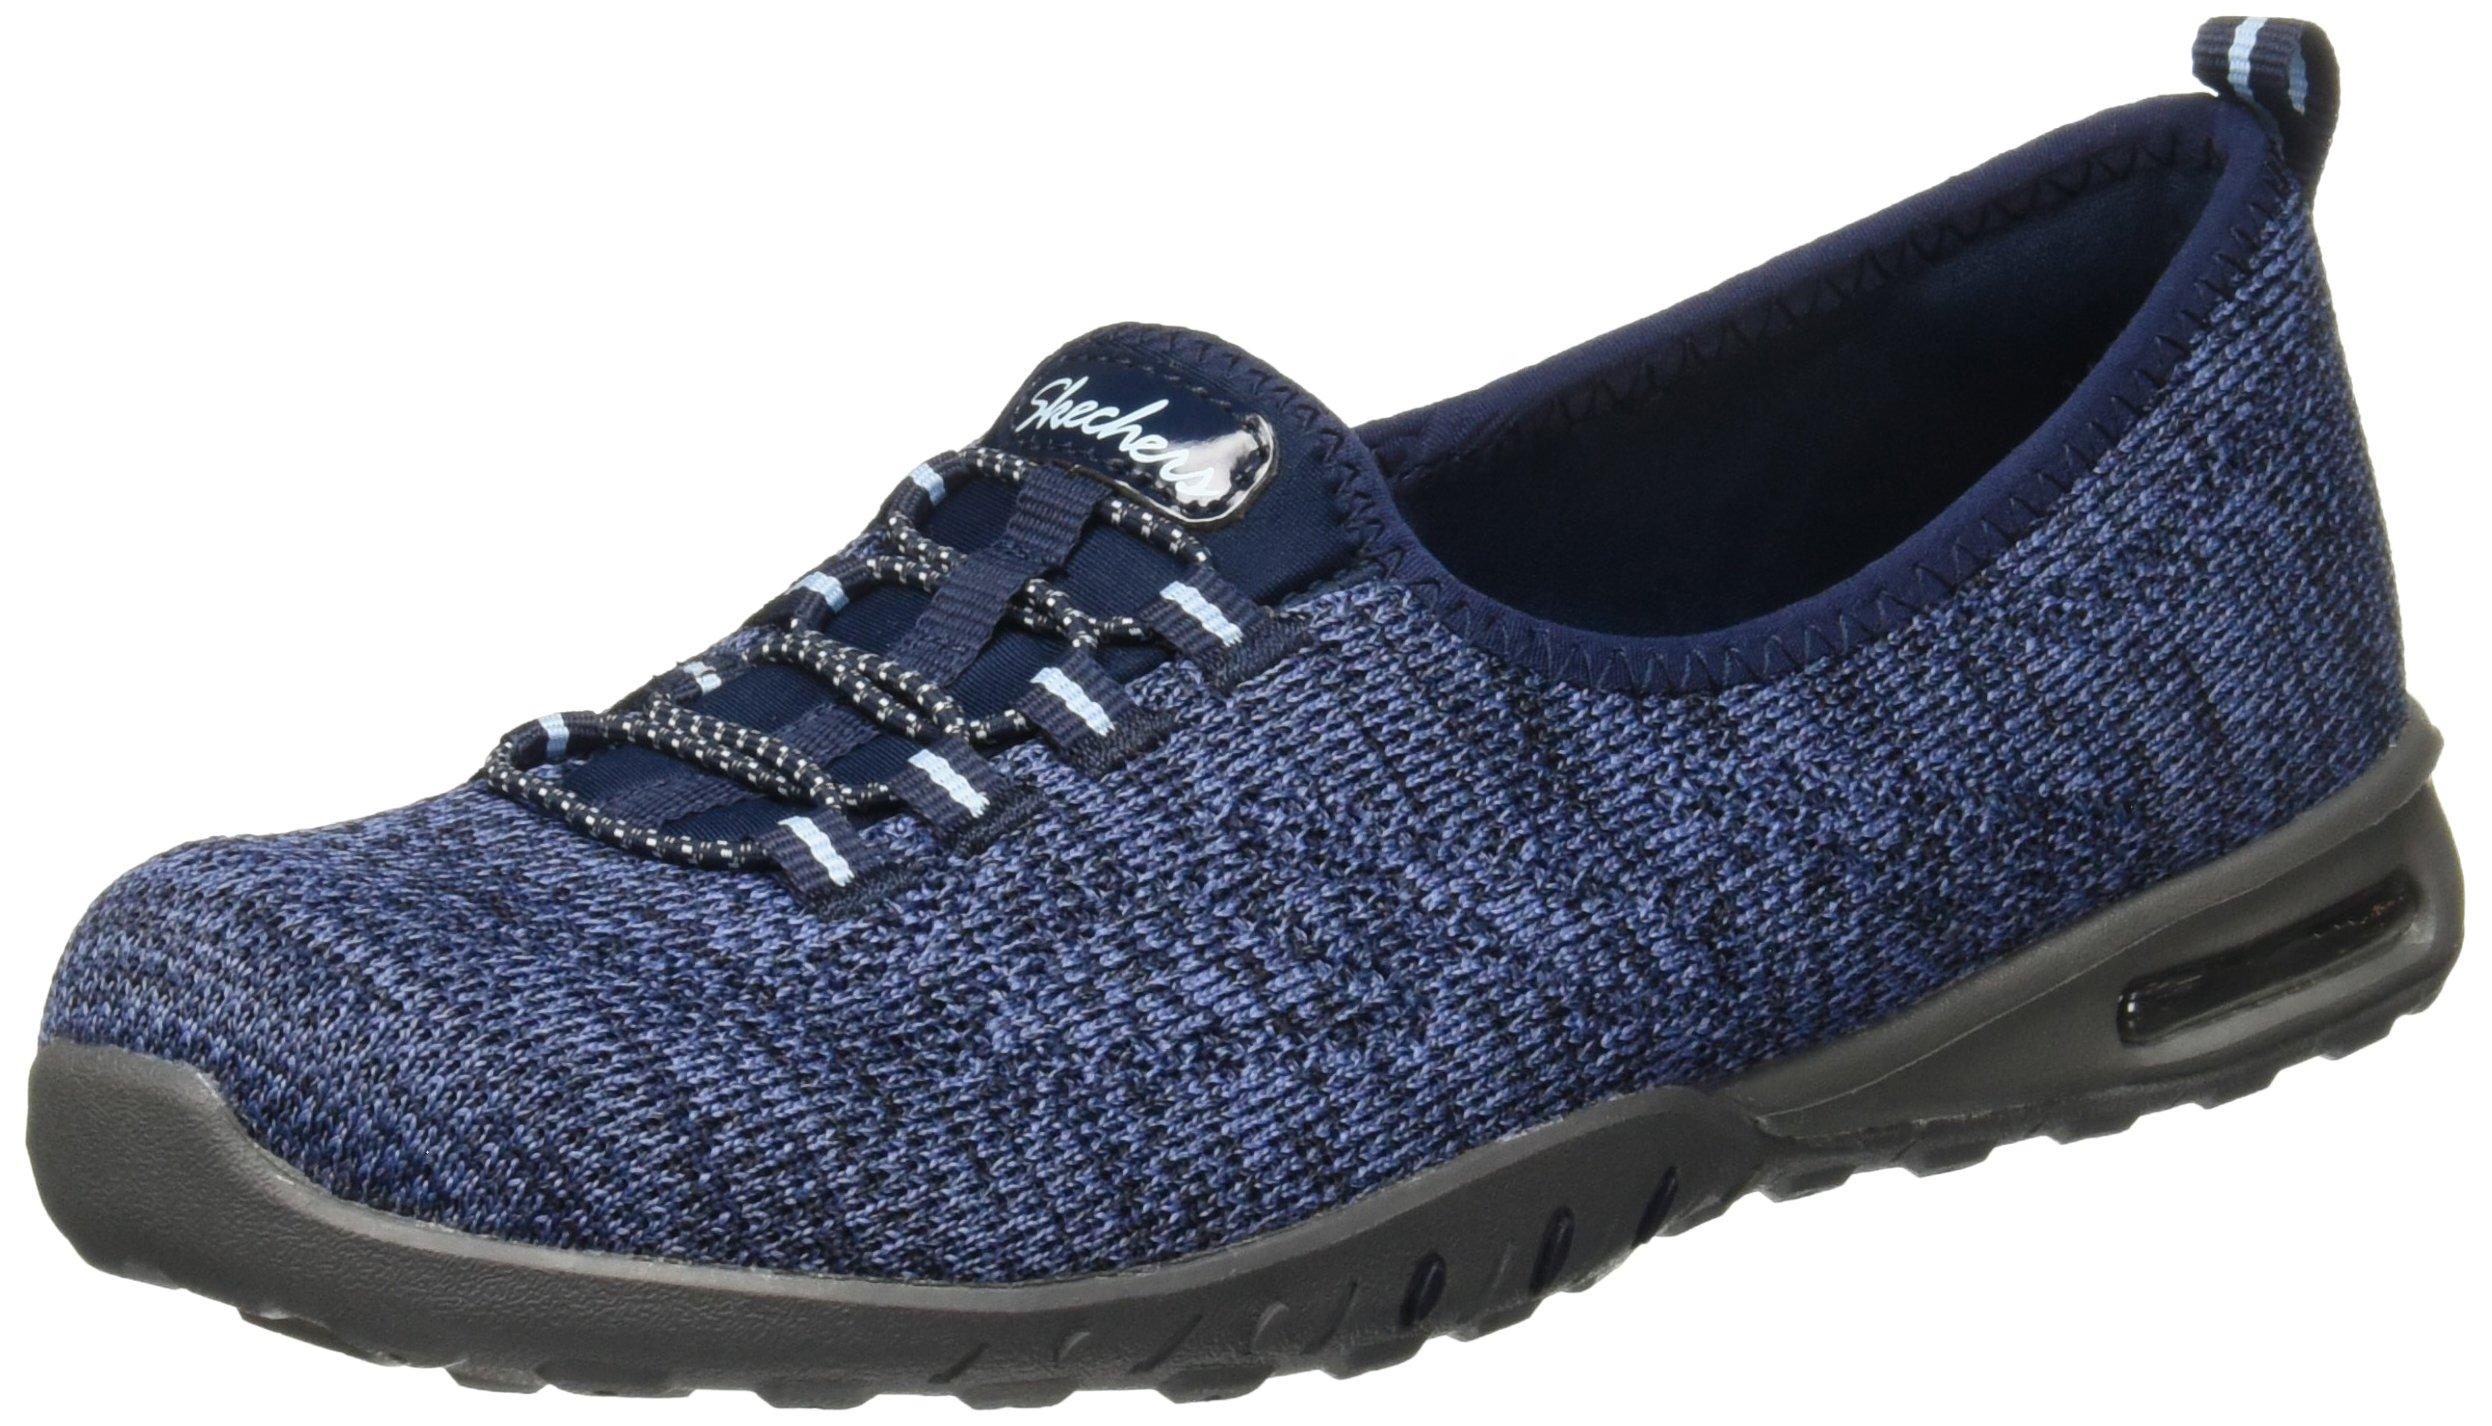 Skechers Relaxed Fit Easy Air In My Dreams Womens Slip On Sneakers Navy 8